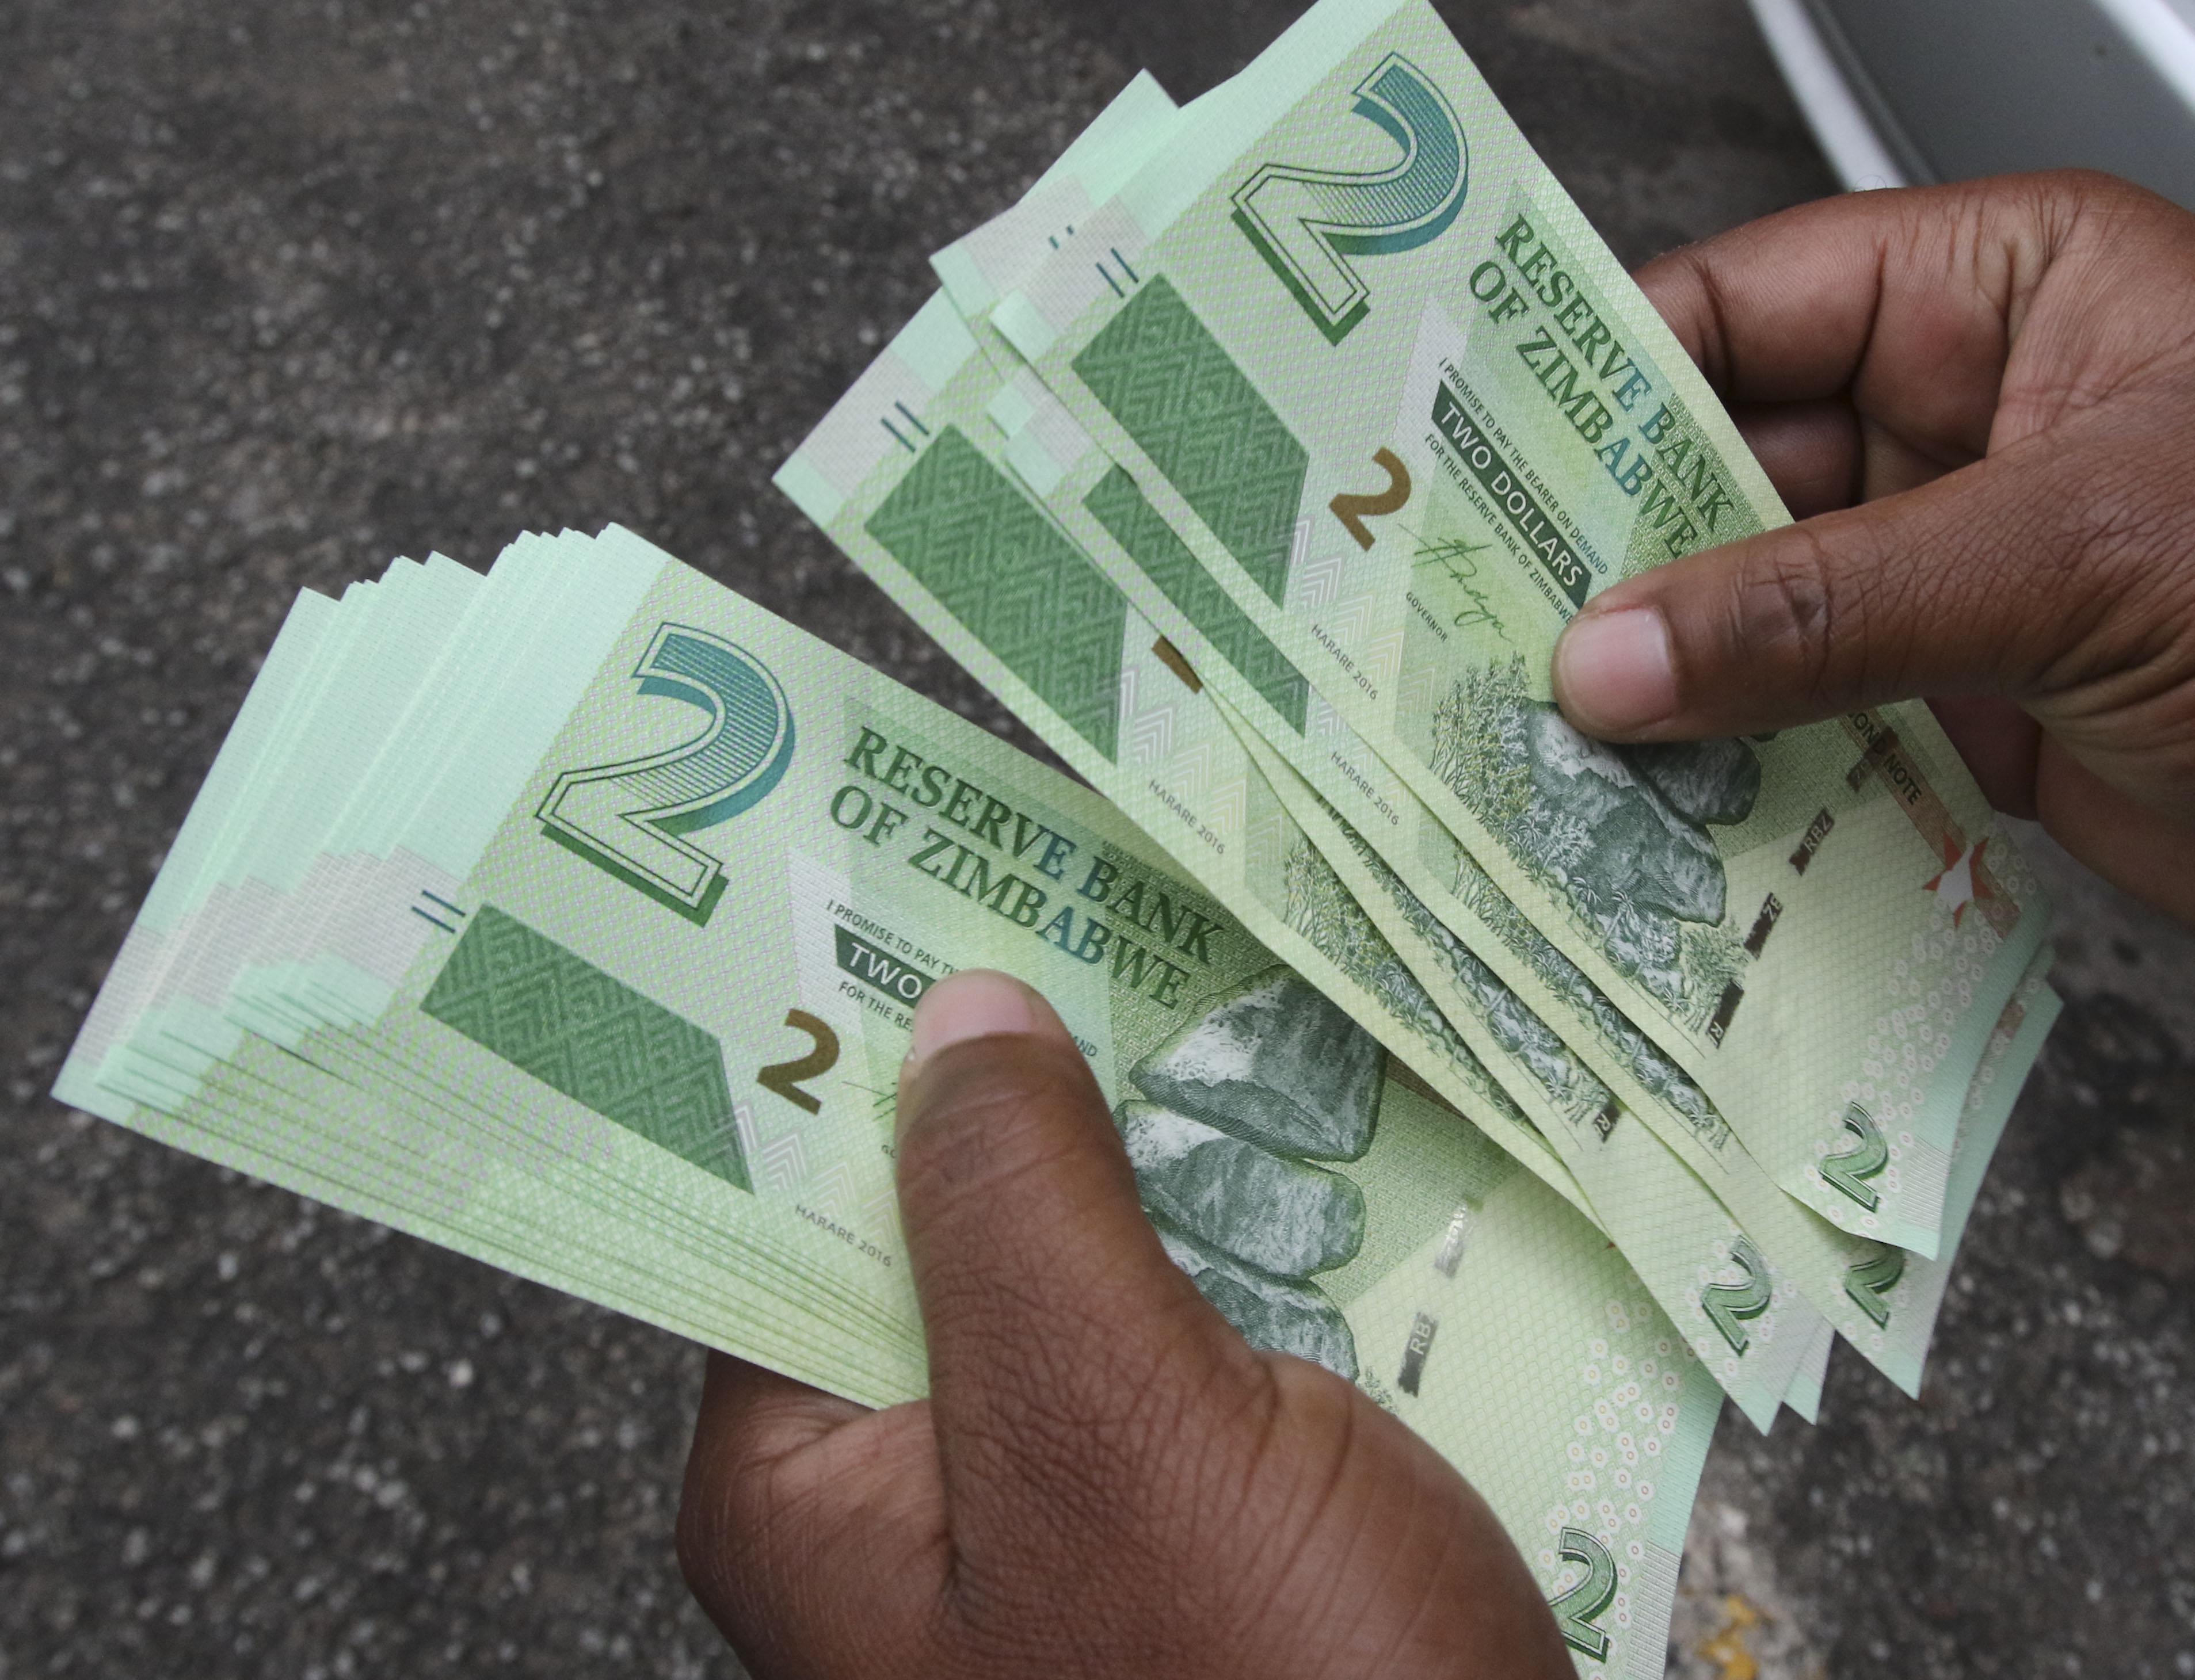 Manitoba payday loans legislation image 9